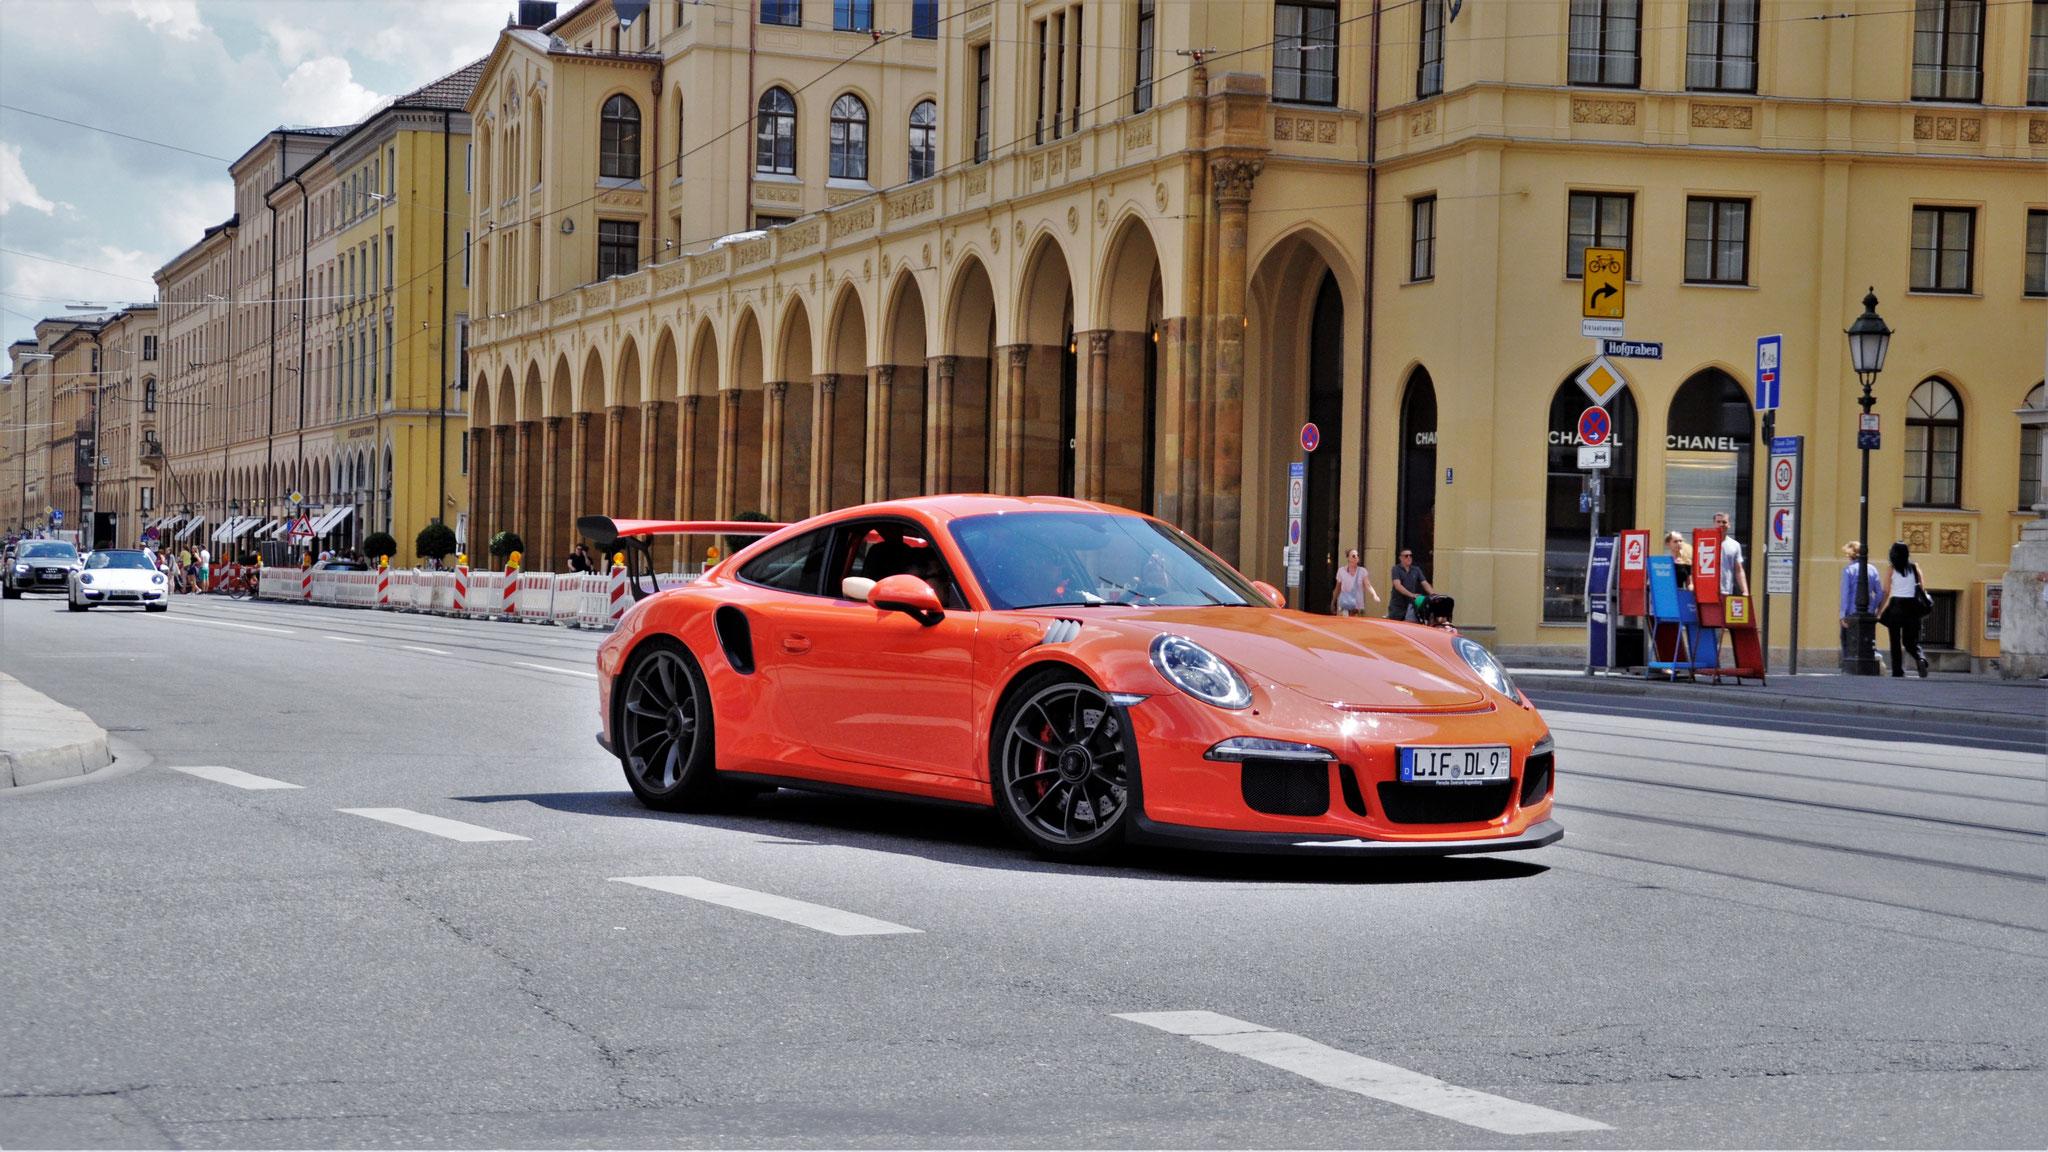 Porsche 911 GT3 RS - LIF-DL-9